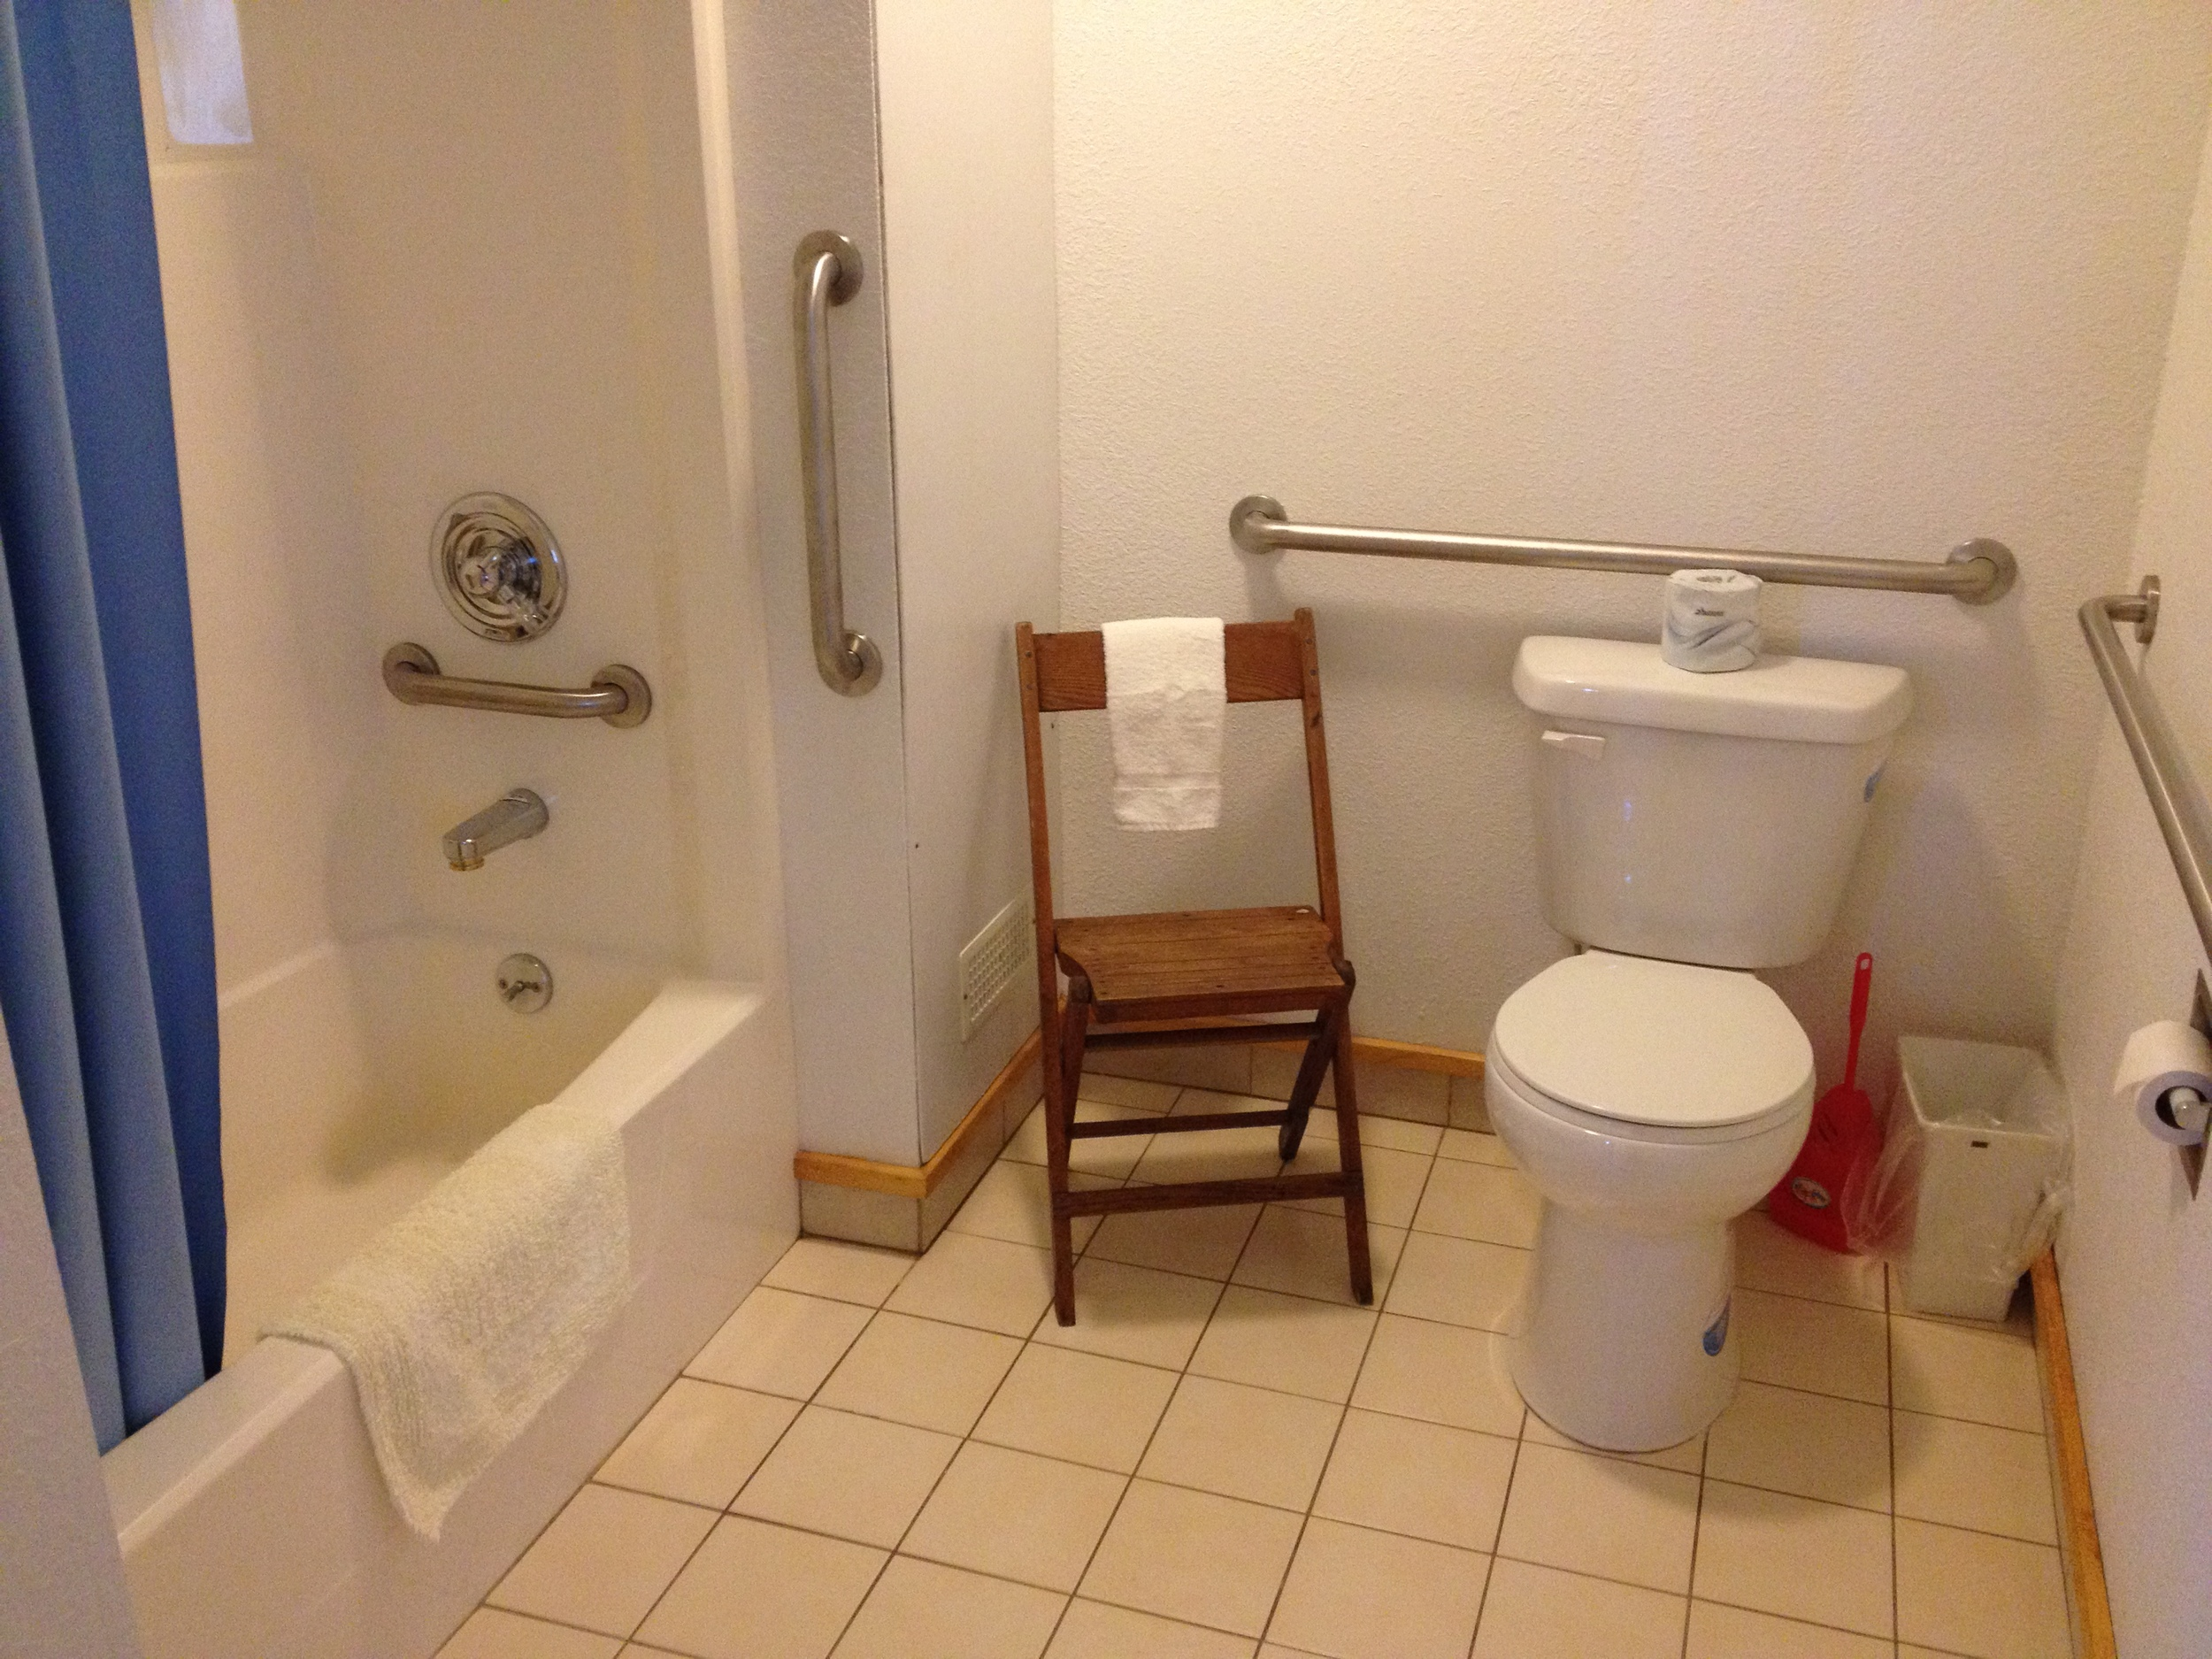 Handicap Bathroom*